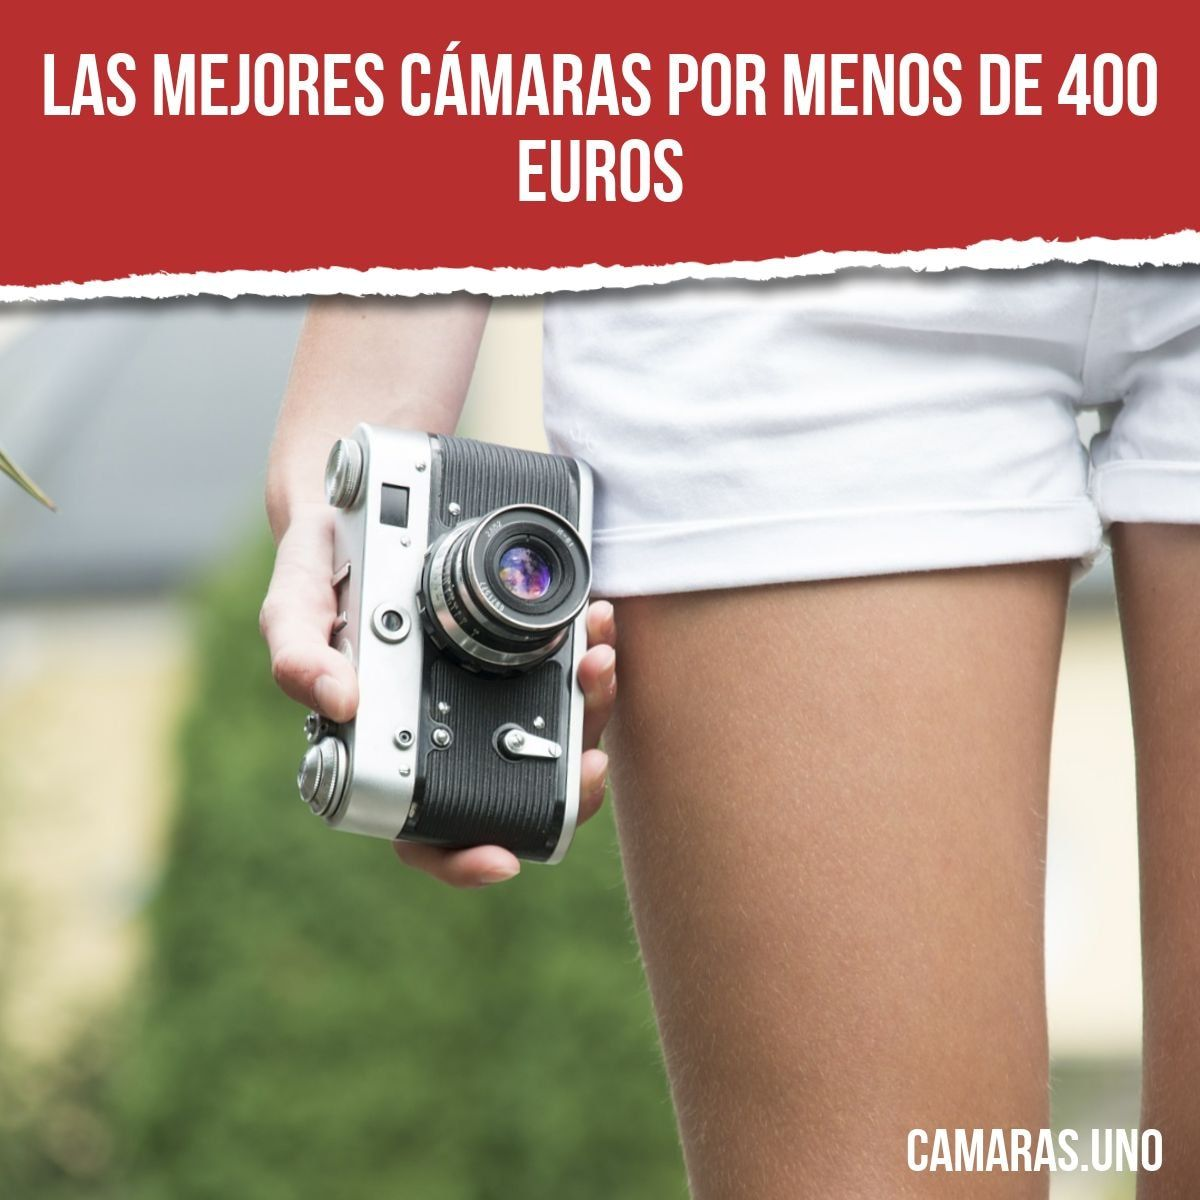 790 Ideas De Camaras Uno En 2021 Cámaras Fotografia Cámaras Digitales